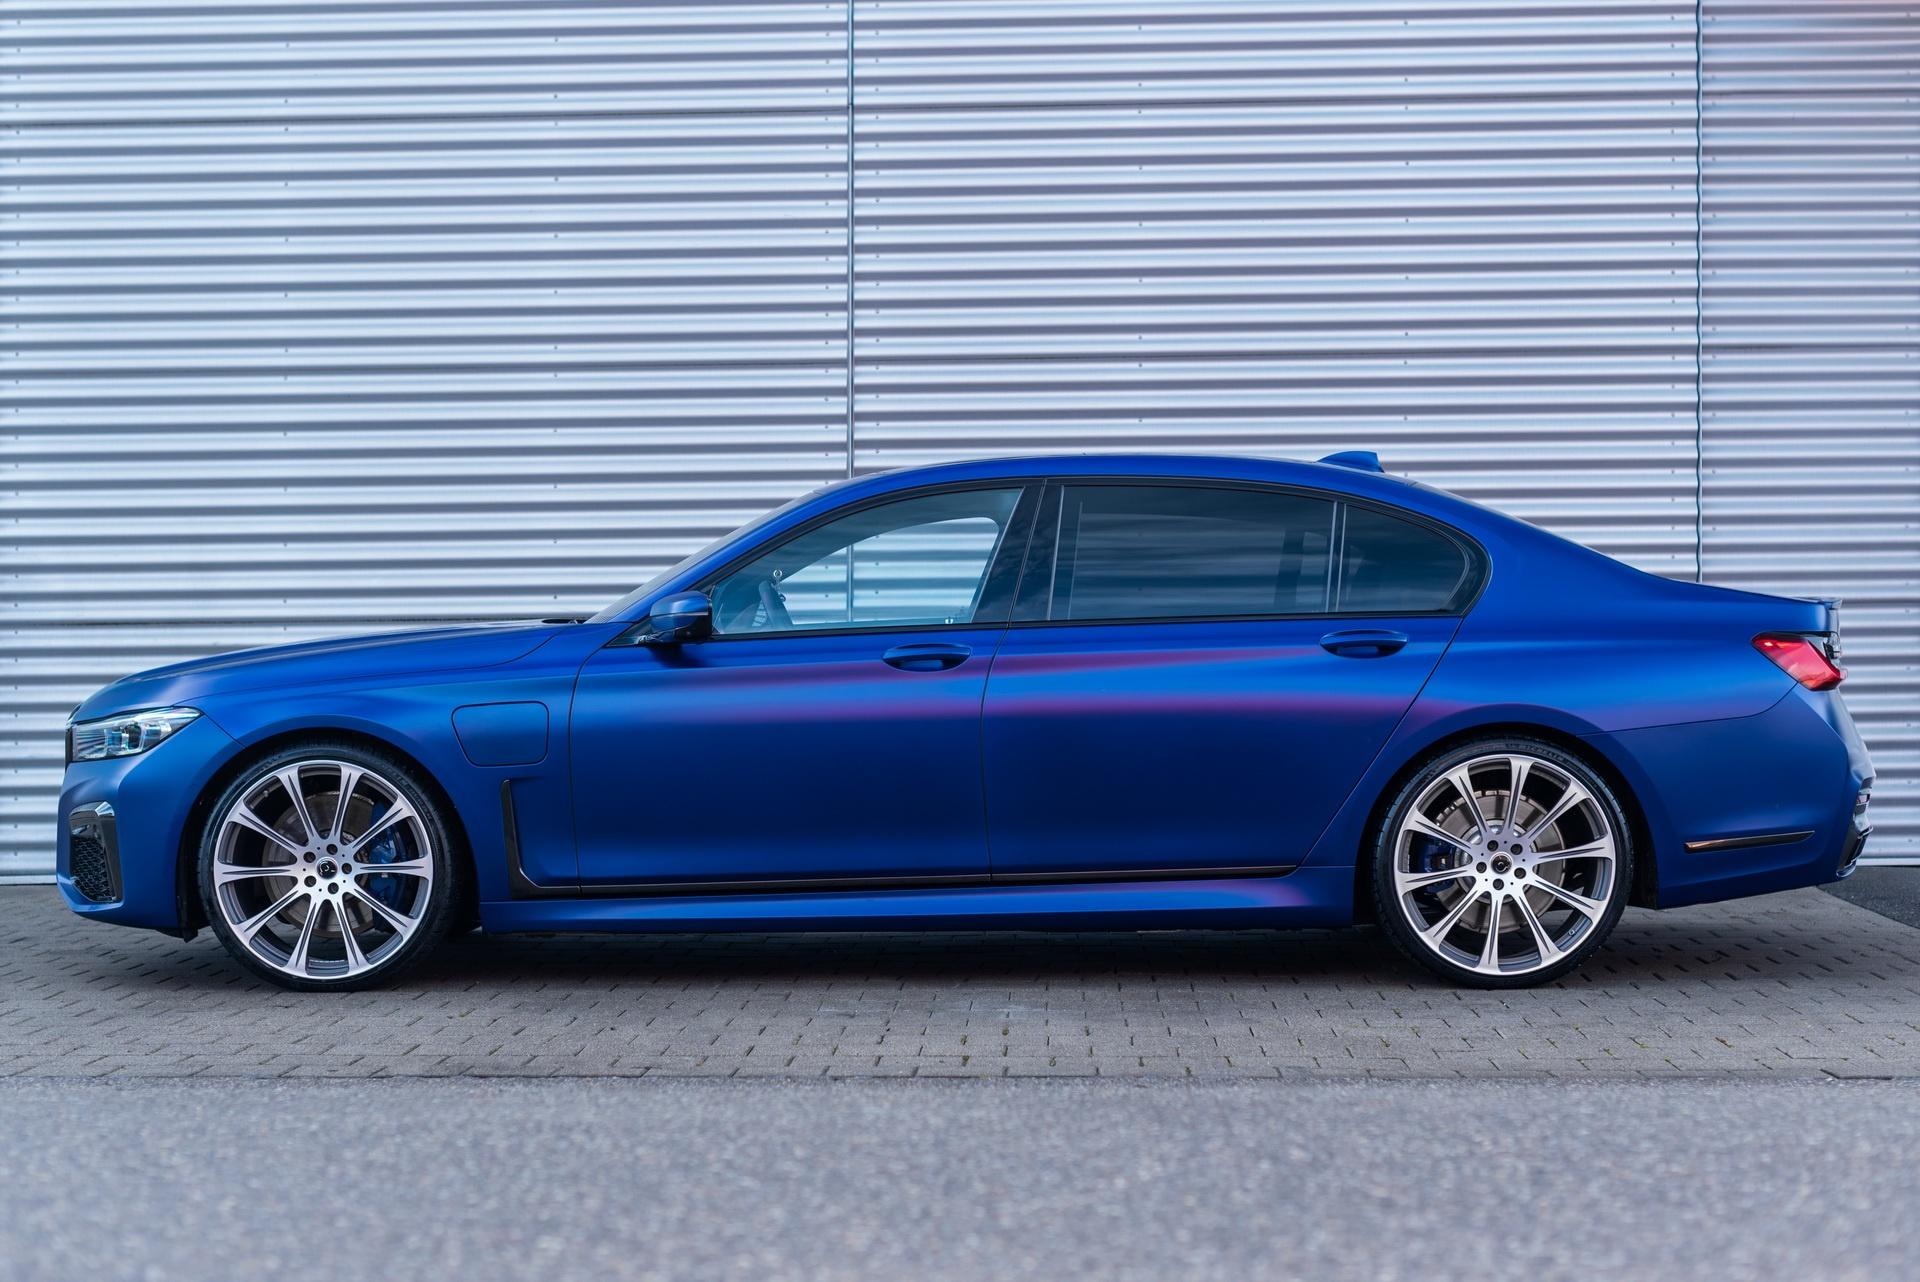 BMW 745Le xDrive po tuningu